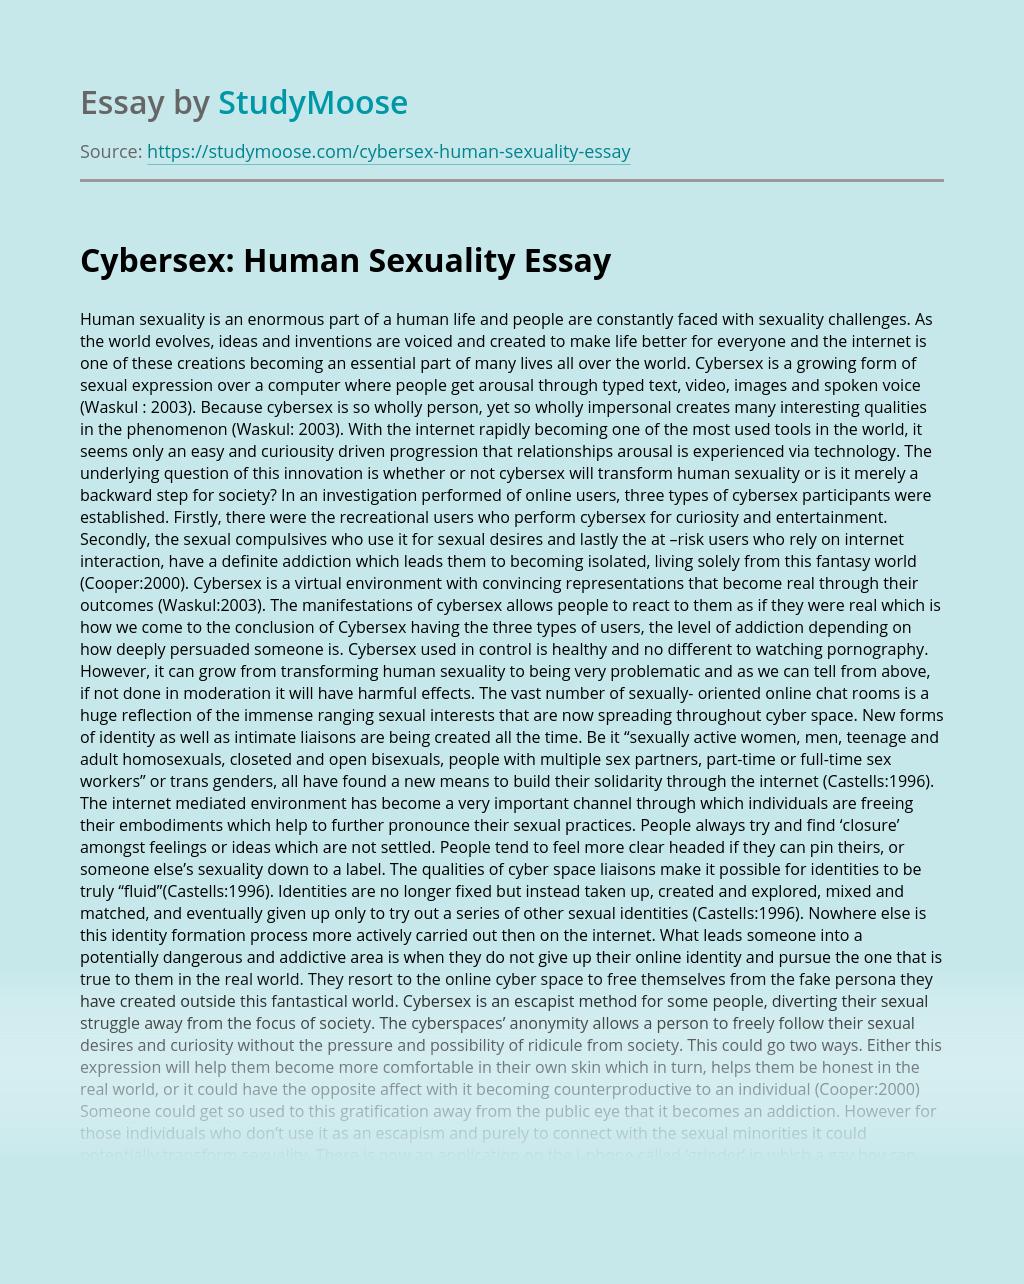 Cybersex: Human Sexuality